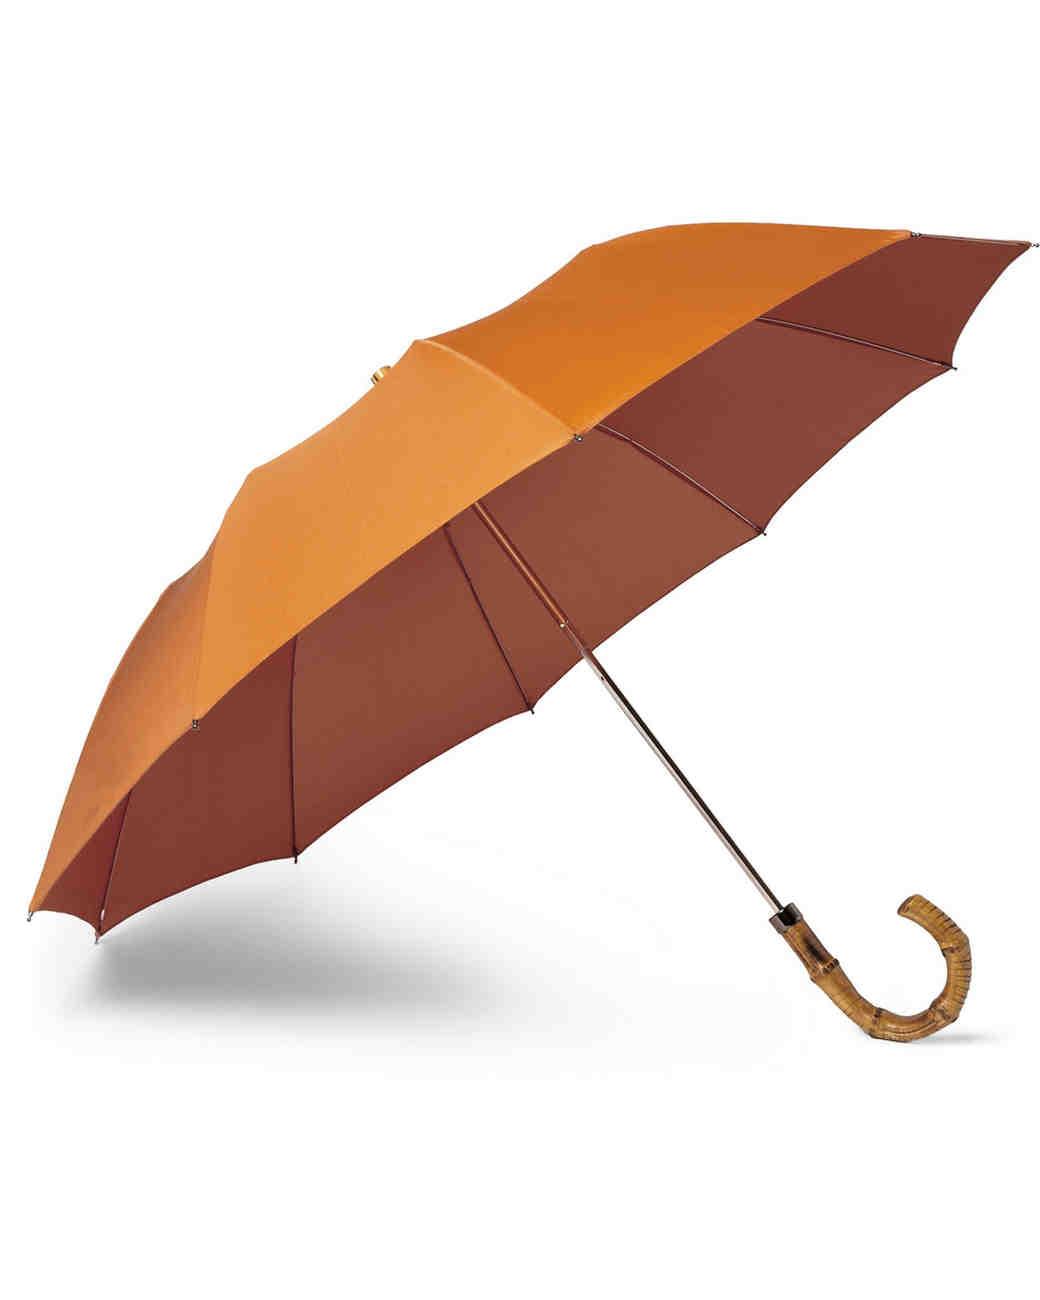 fathers-gift-guide-accessories-umbrella-mrporter-0515.jpg